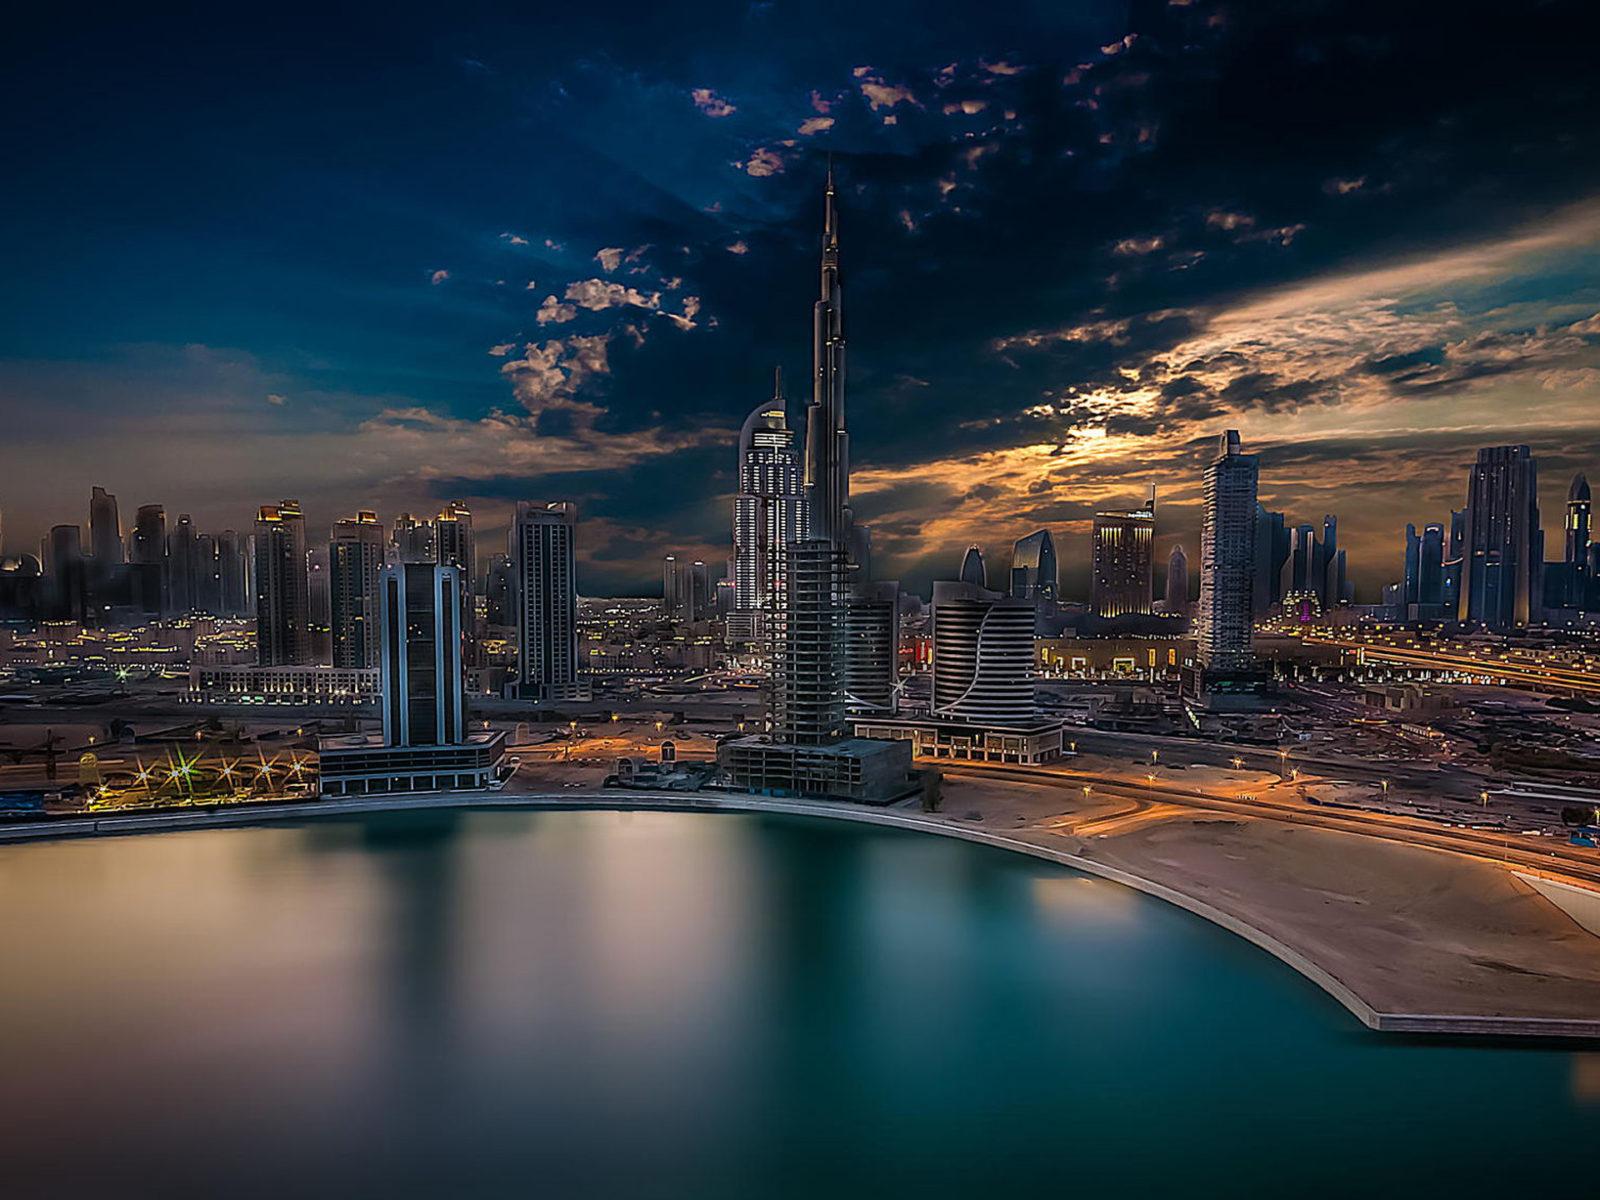 Cars Wallpaper Download For Pc City Dubai Arabic Dream Burj Khalifa United Arab Emirates